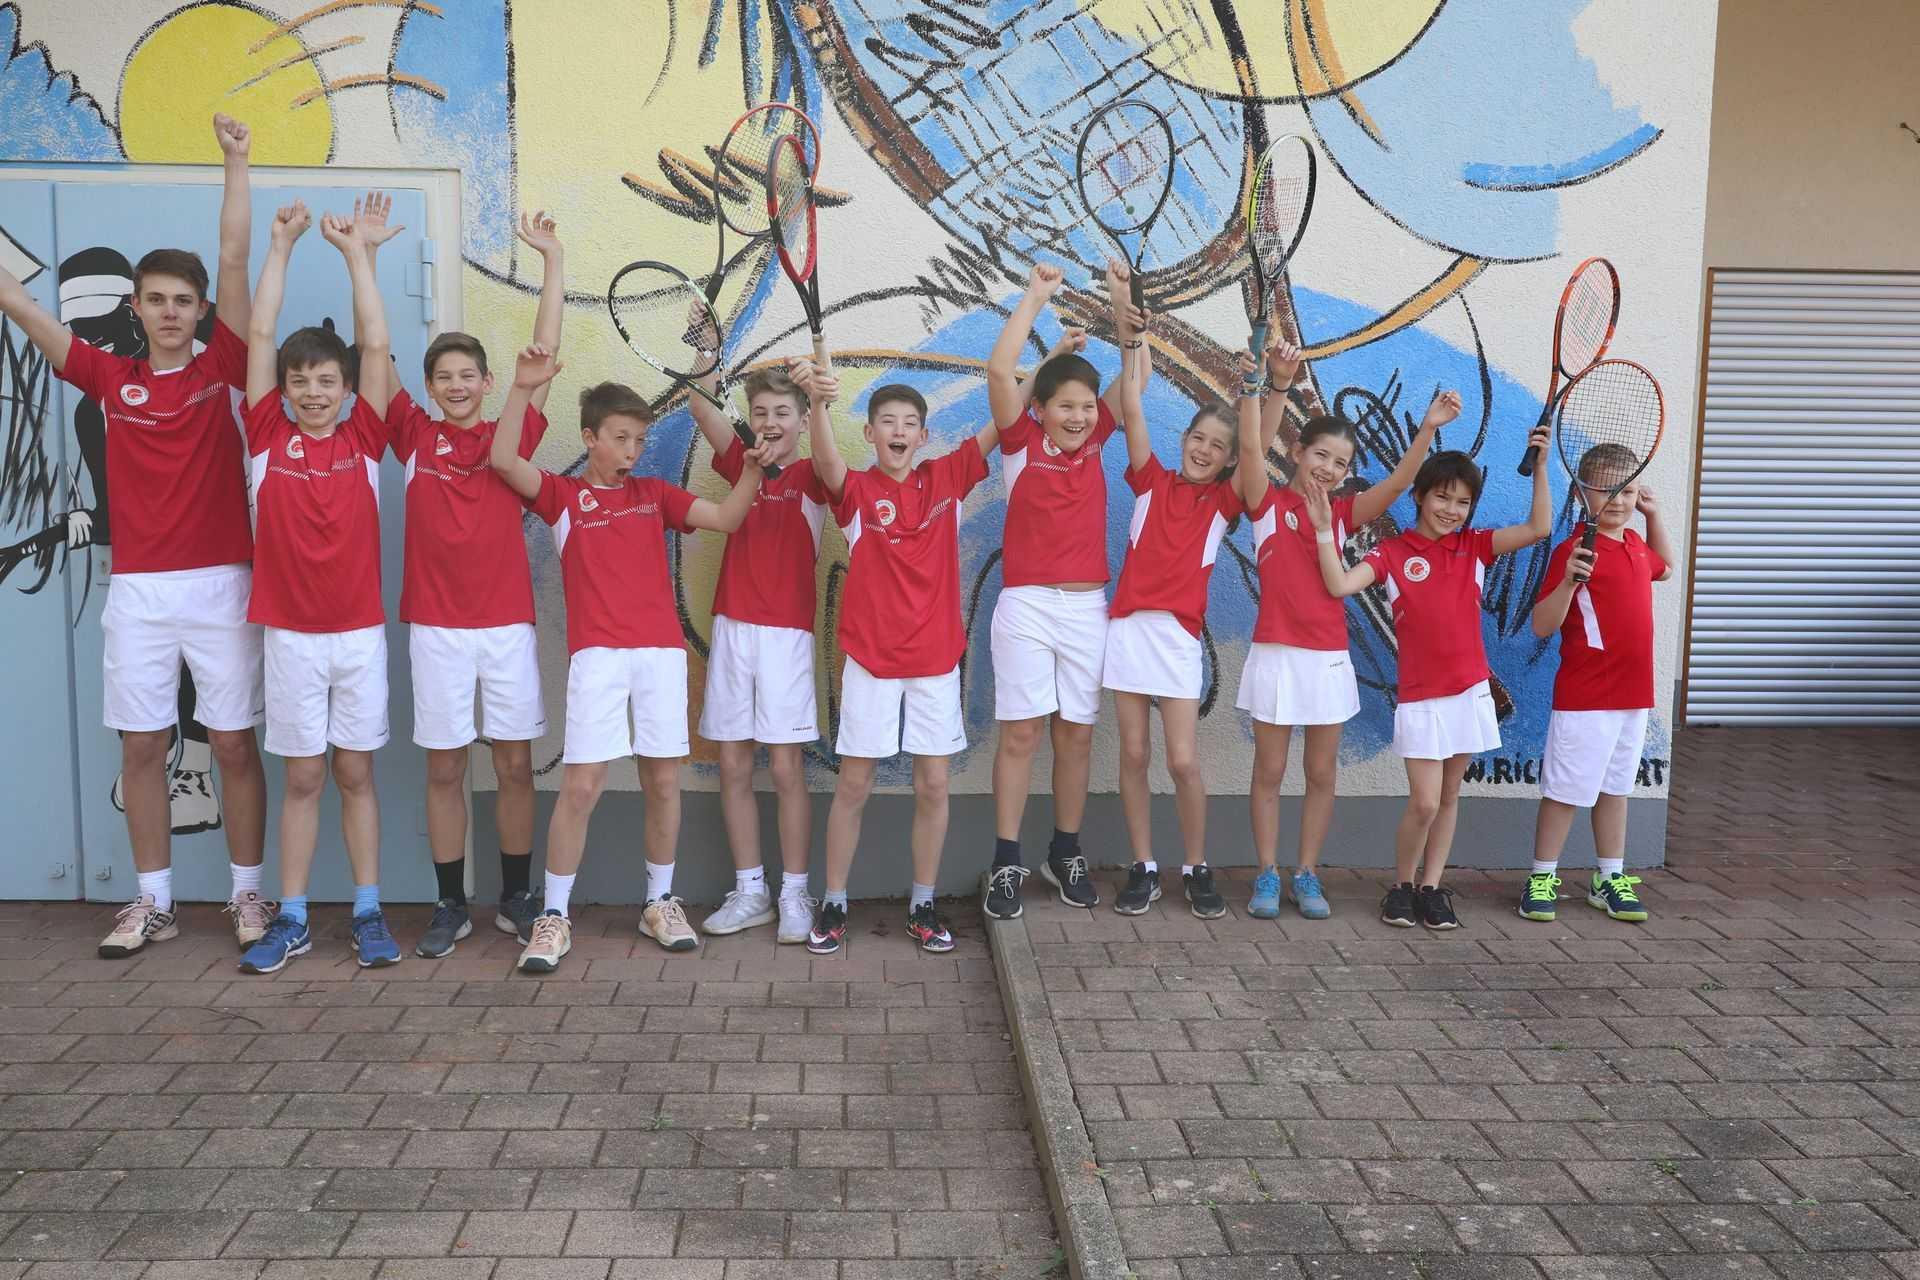 Tennisverein Kenzingen manschafte 17